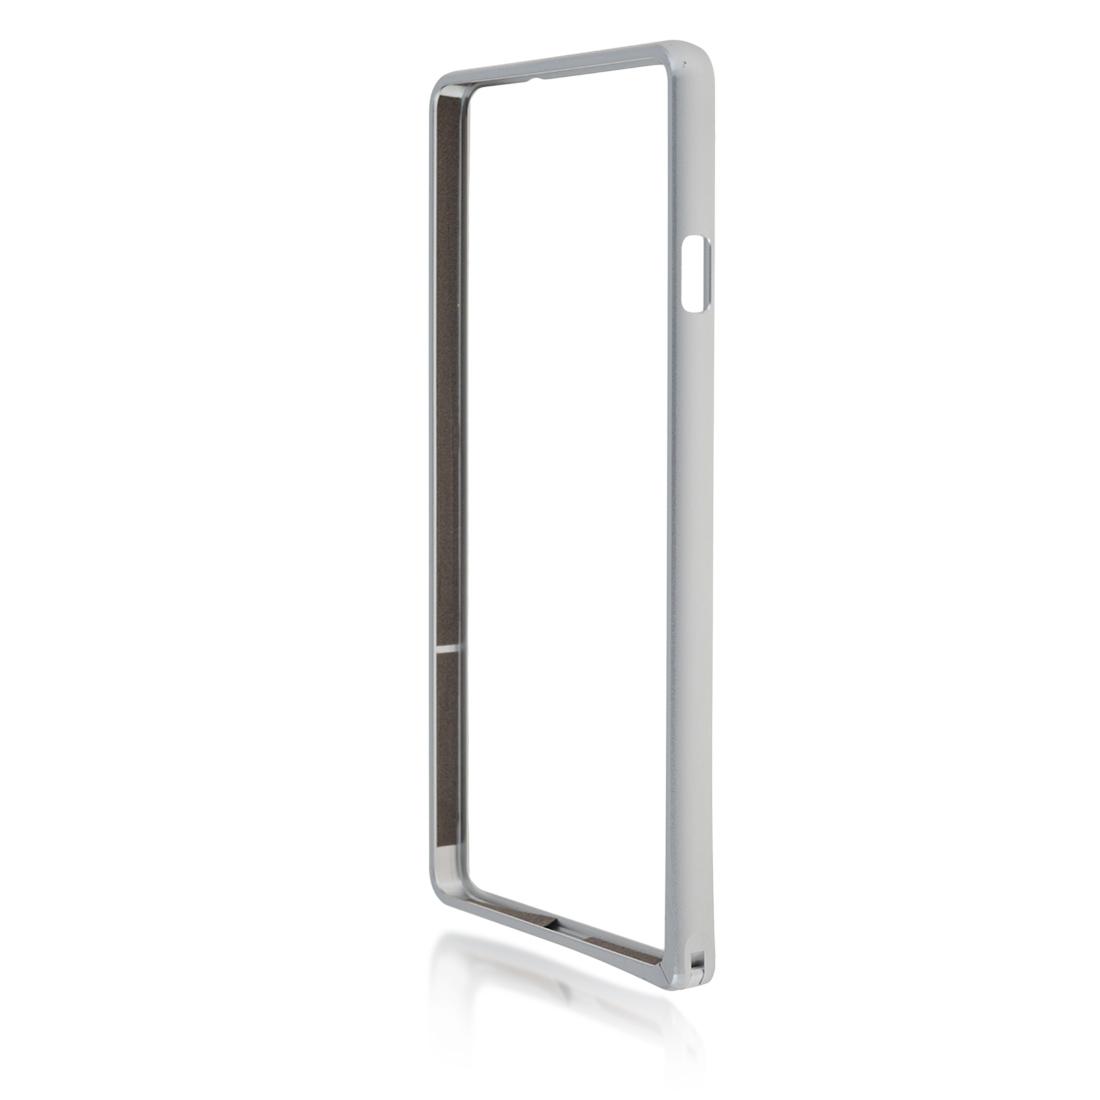 Бампер металлический серебристый для Xperia C4